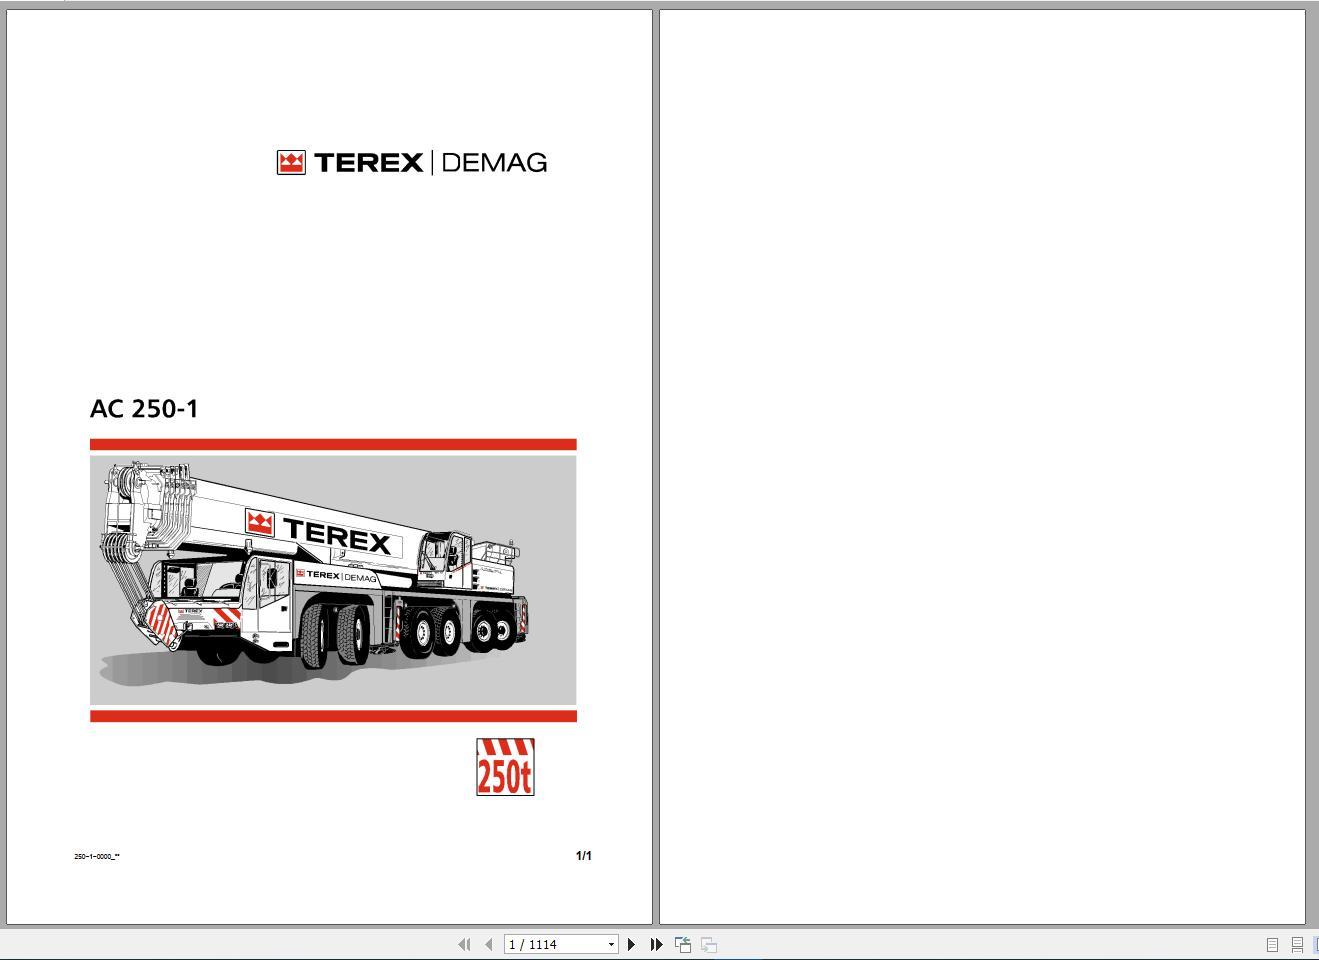 Terex Demag Mobile Crane AC250-1 300 ton Technical Manual, Operator Manual